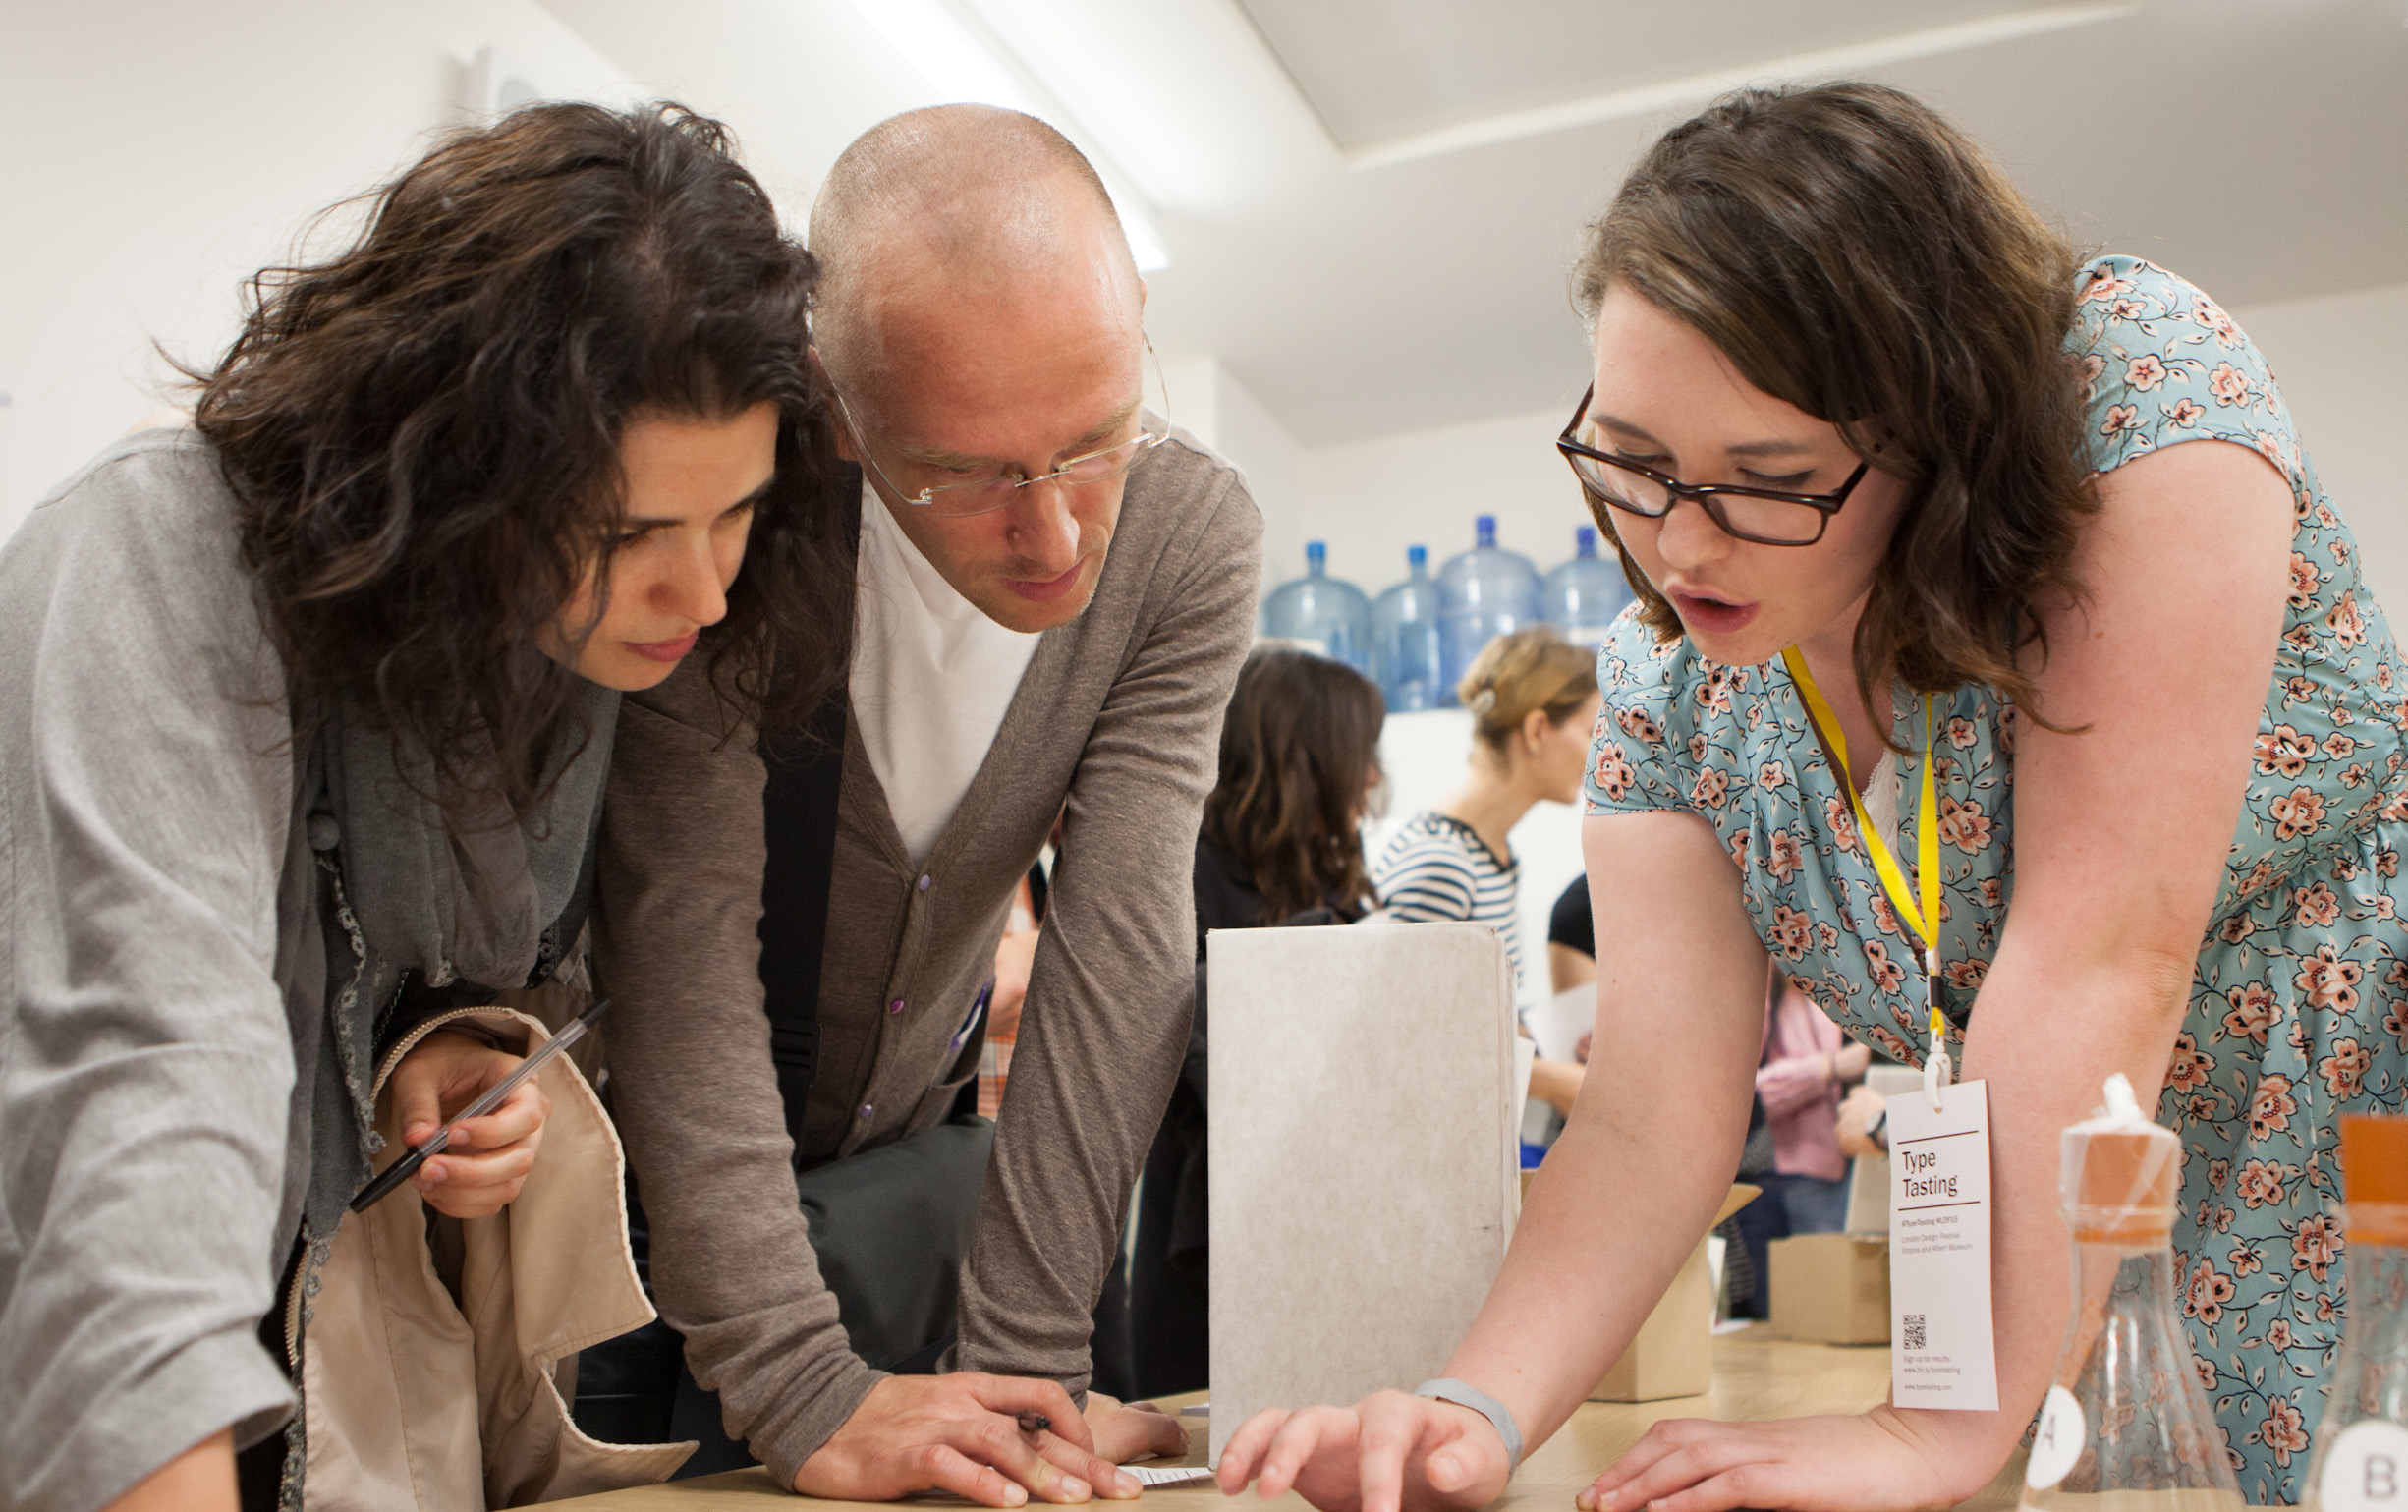 Client workshop photo by David Owens